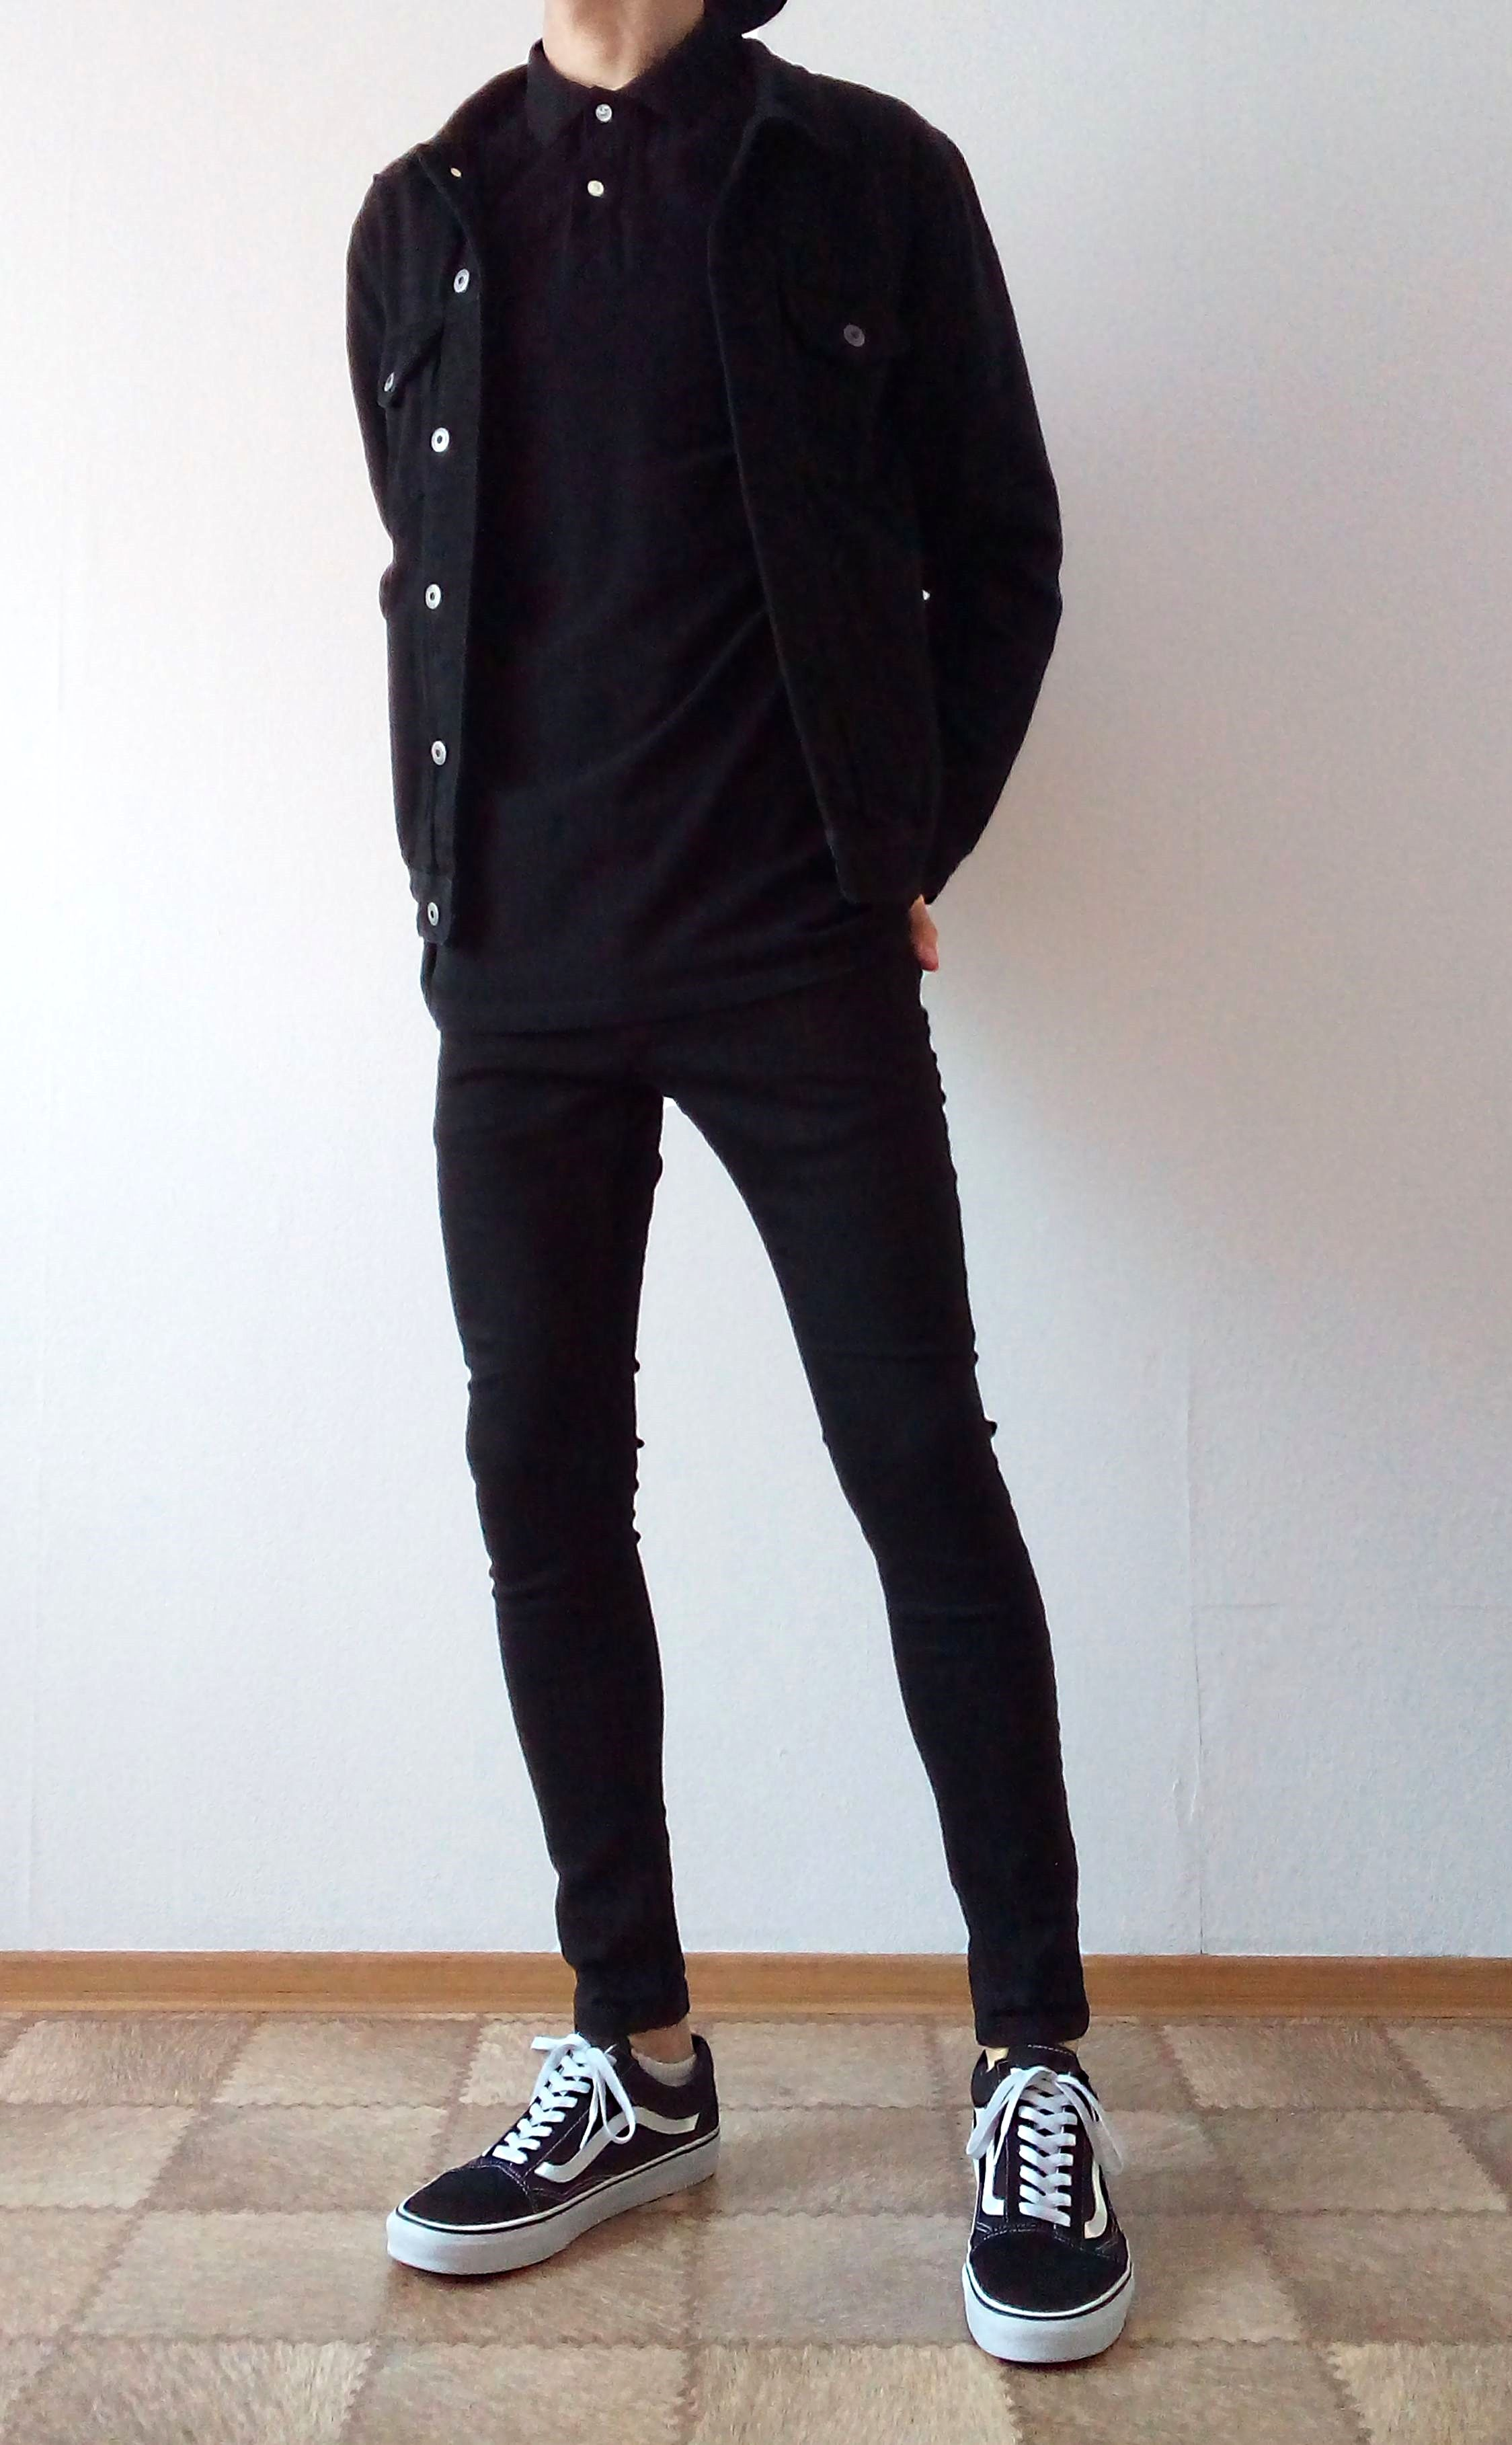 llegar enemigo Componer  vans old skool black skinny jeans boys guys outfit   vans love   Ropa de  moda hombre, Ropa hipster hombre, Ropa juvenil hombre